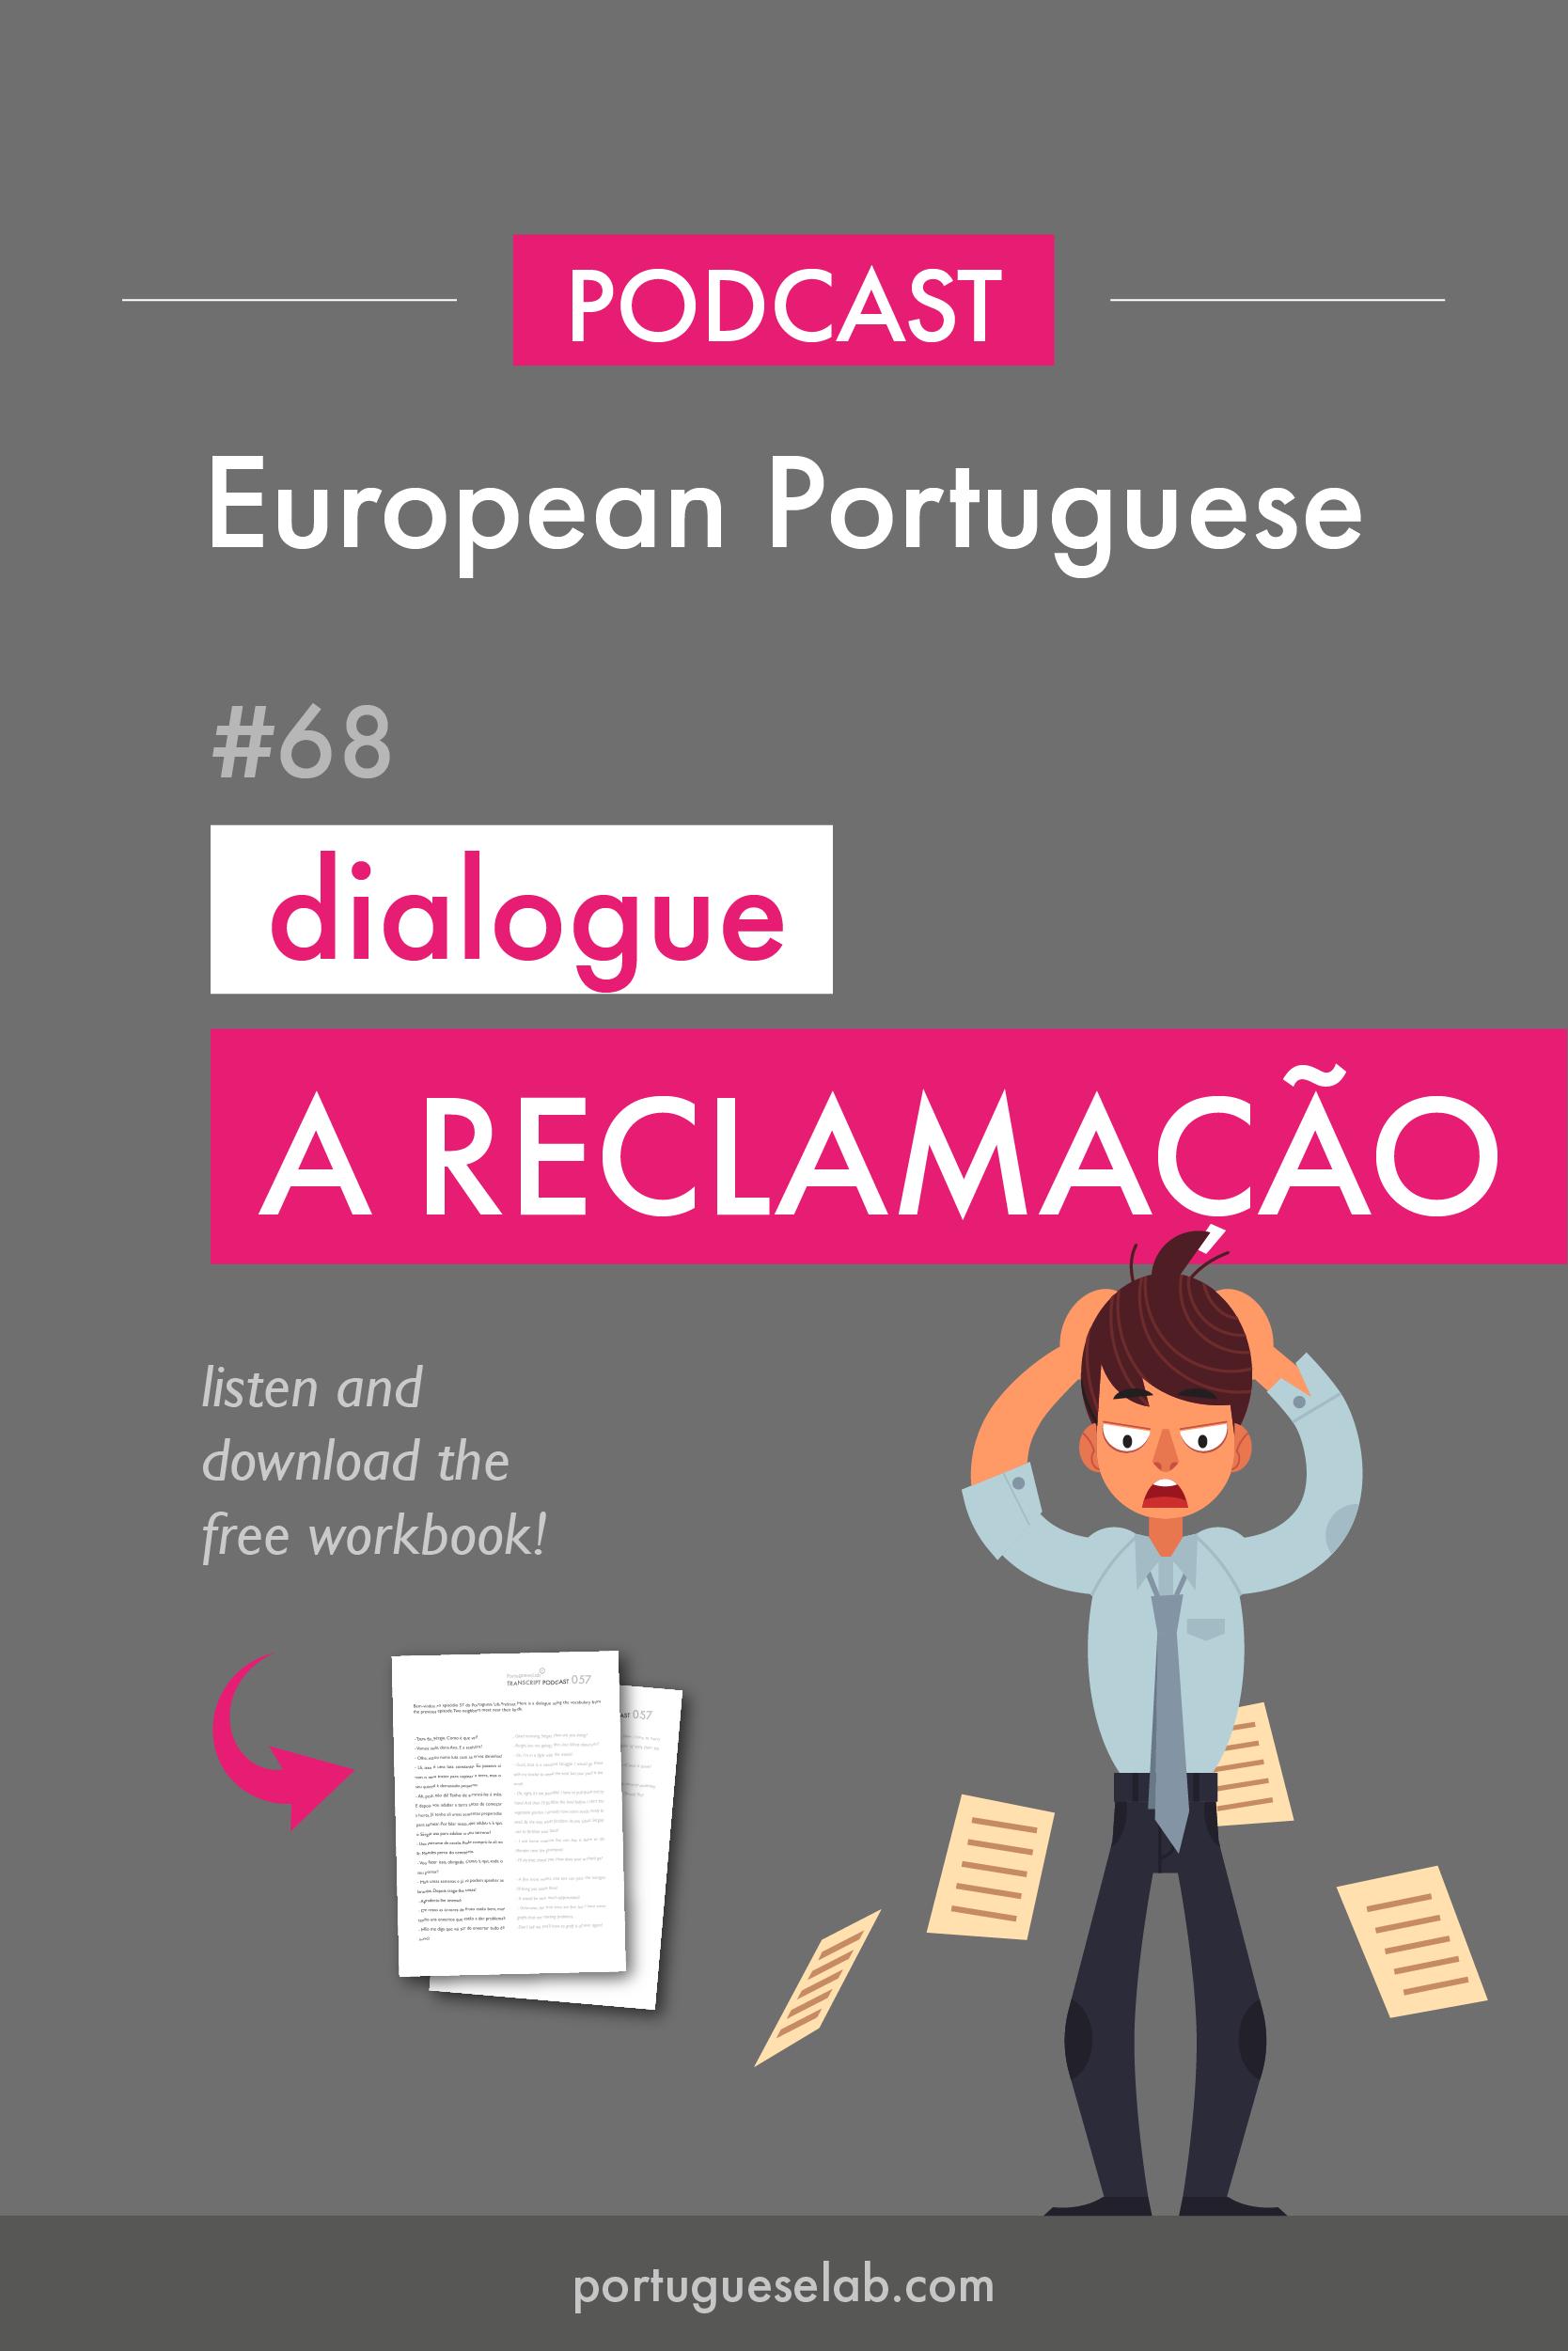 Portuguese Lab Podcast - European Portuguese - 68 - Advanced - Dialogue - A reclamacao.png